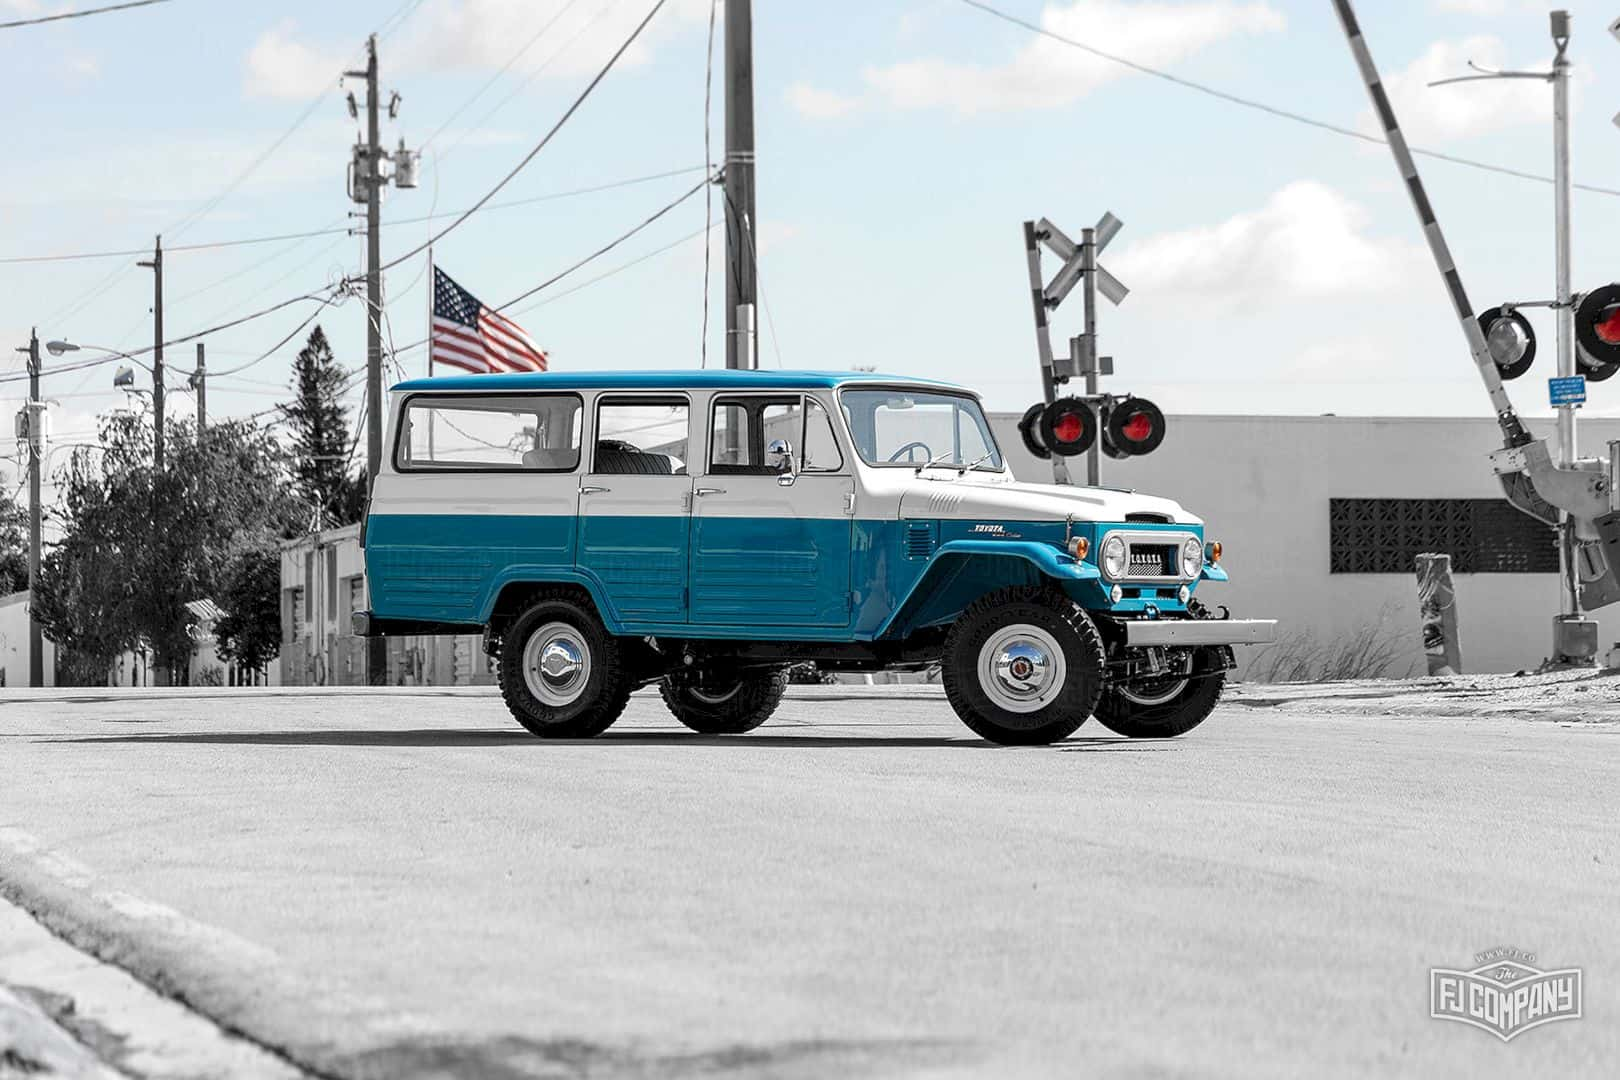 1967 Toyota Land Cruiser Fj45lv Capri Blue 9